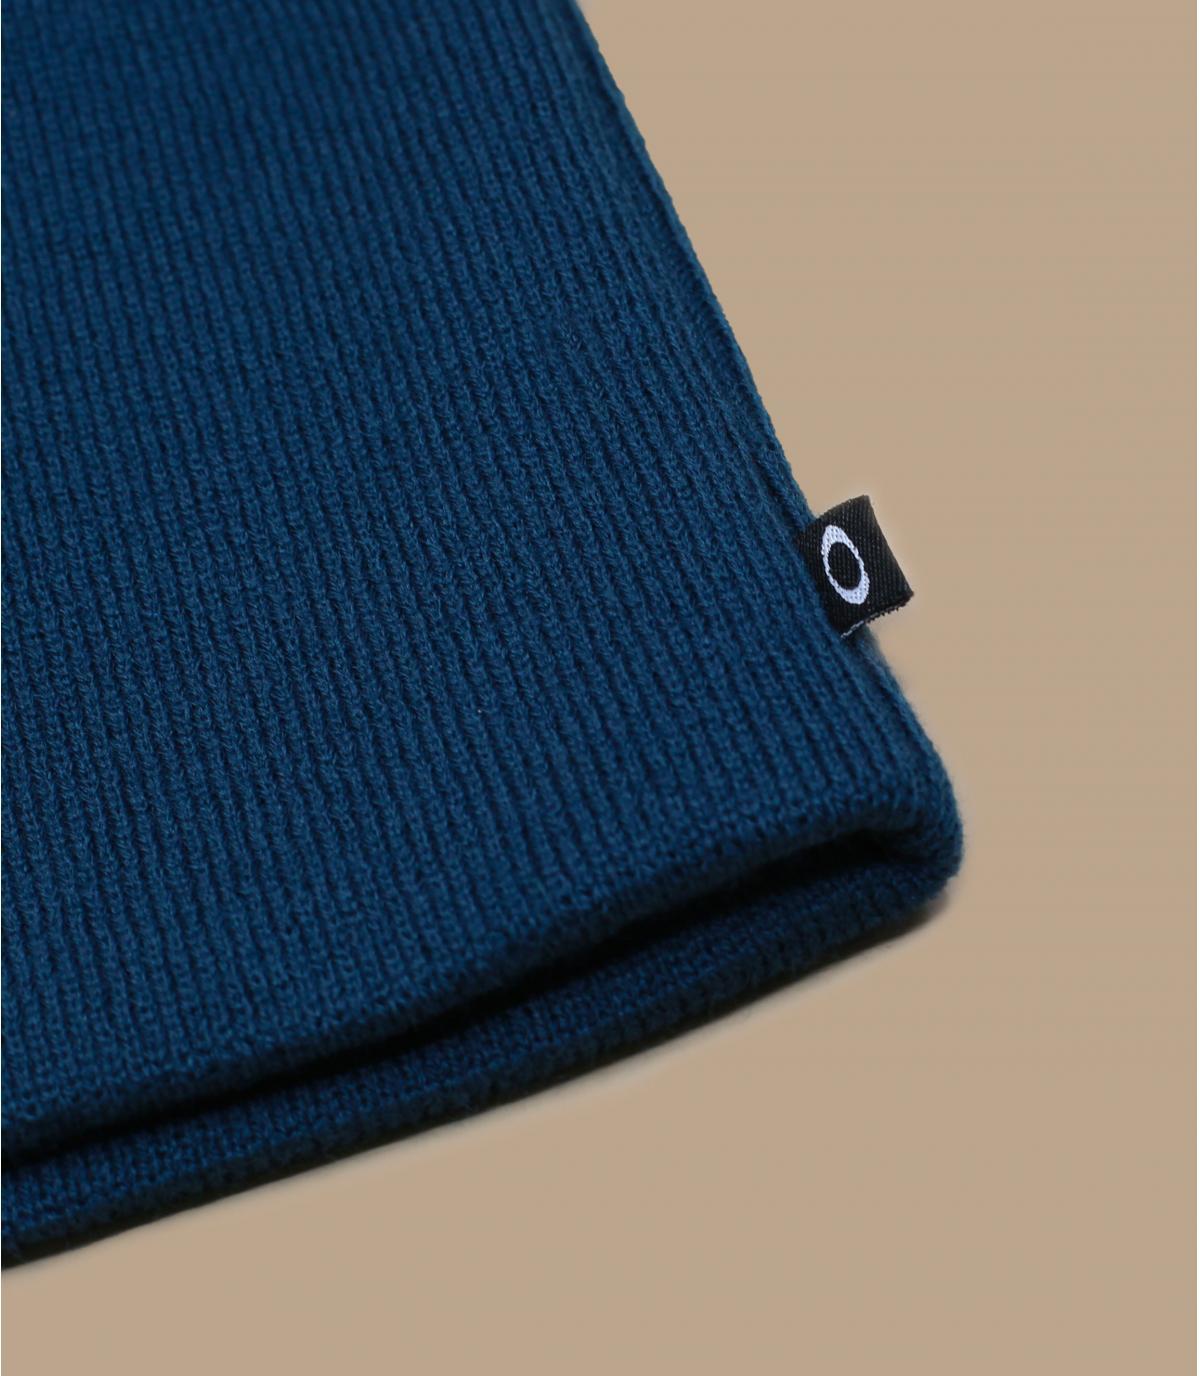 Detalles Fine Knit Beanie pond blue imagen 2